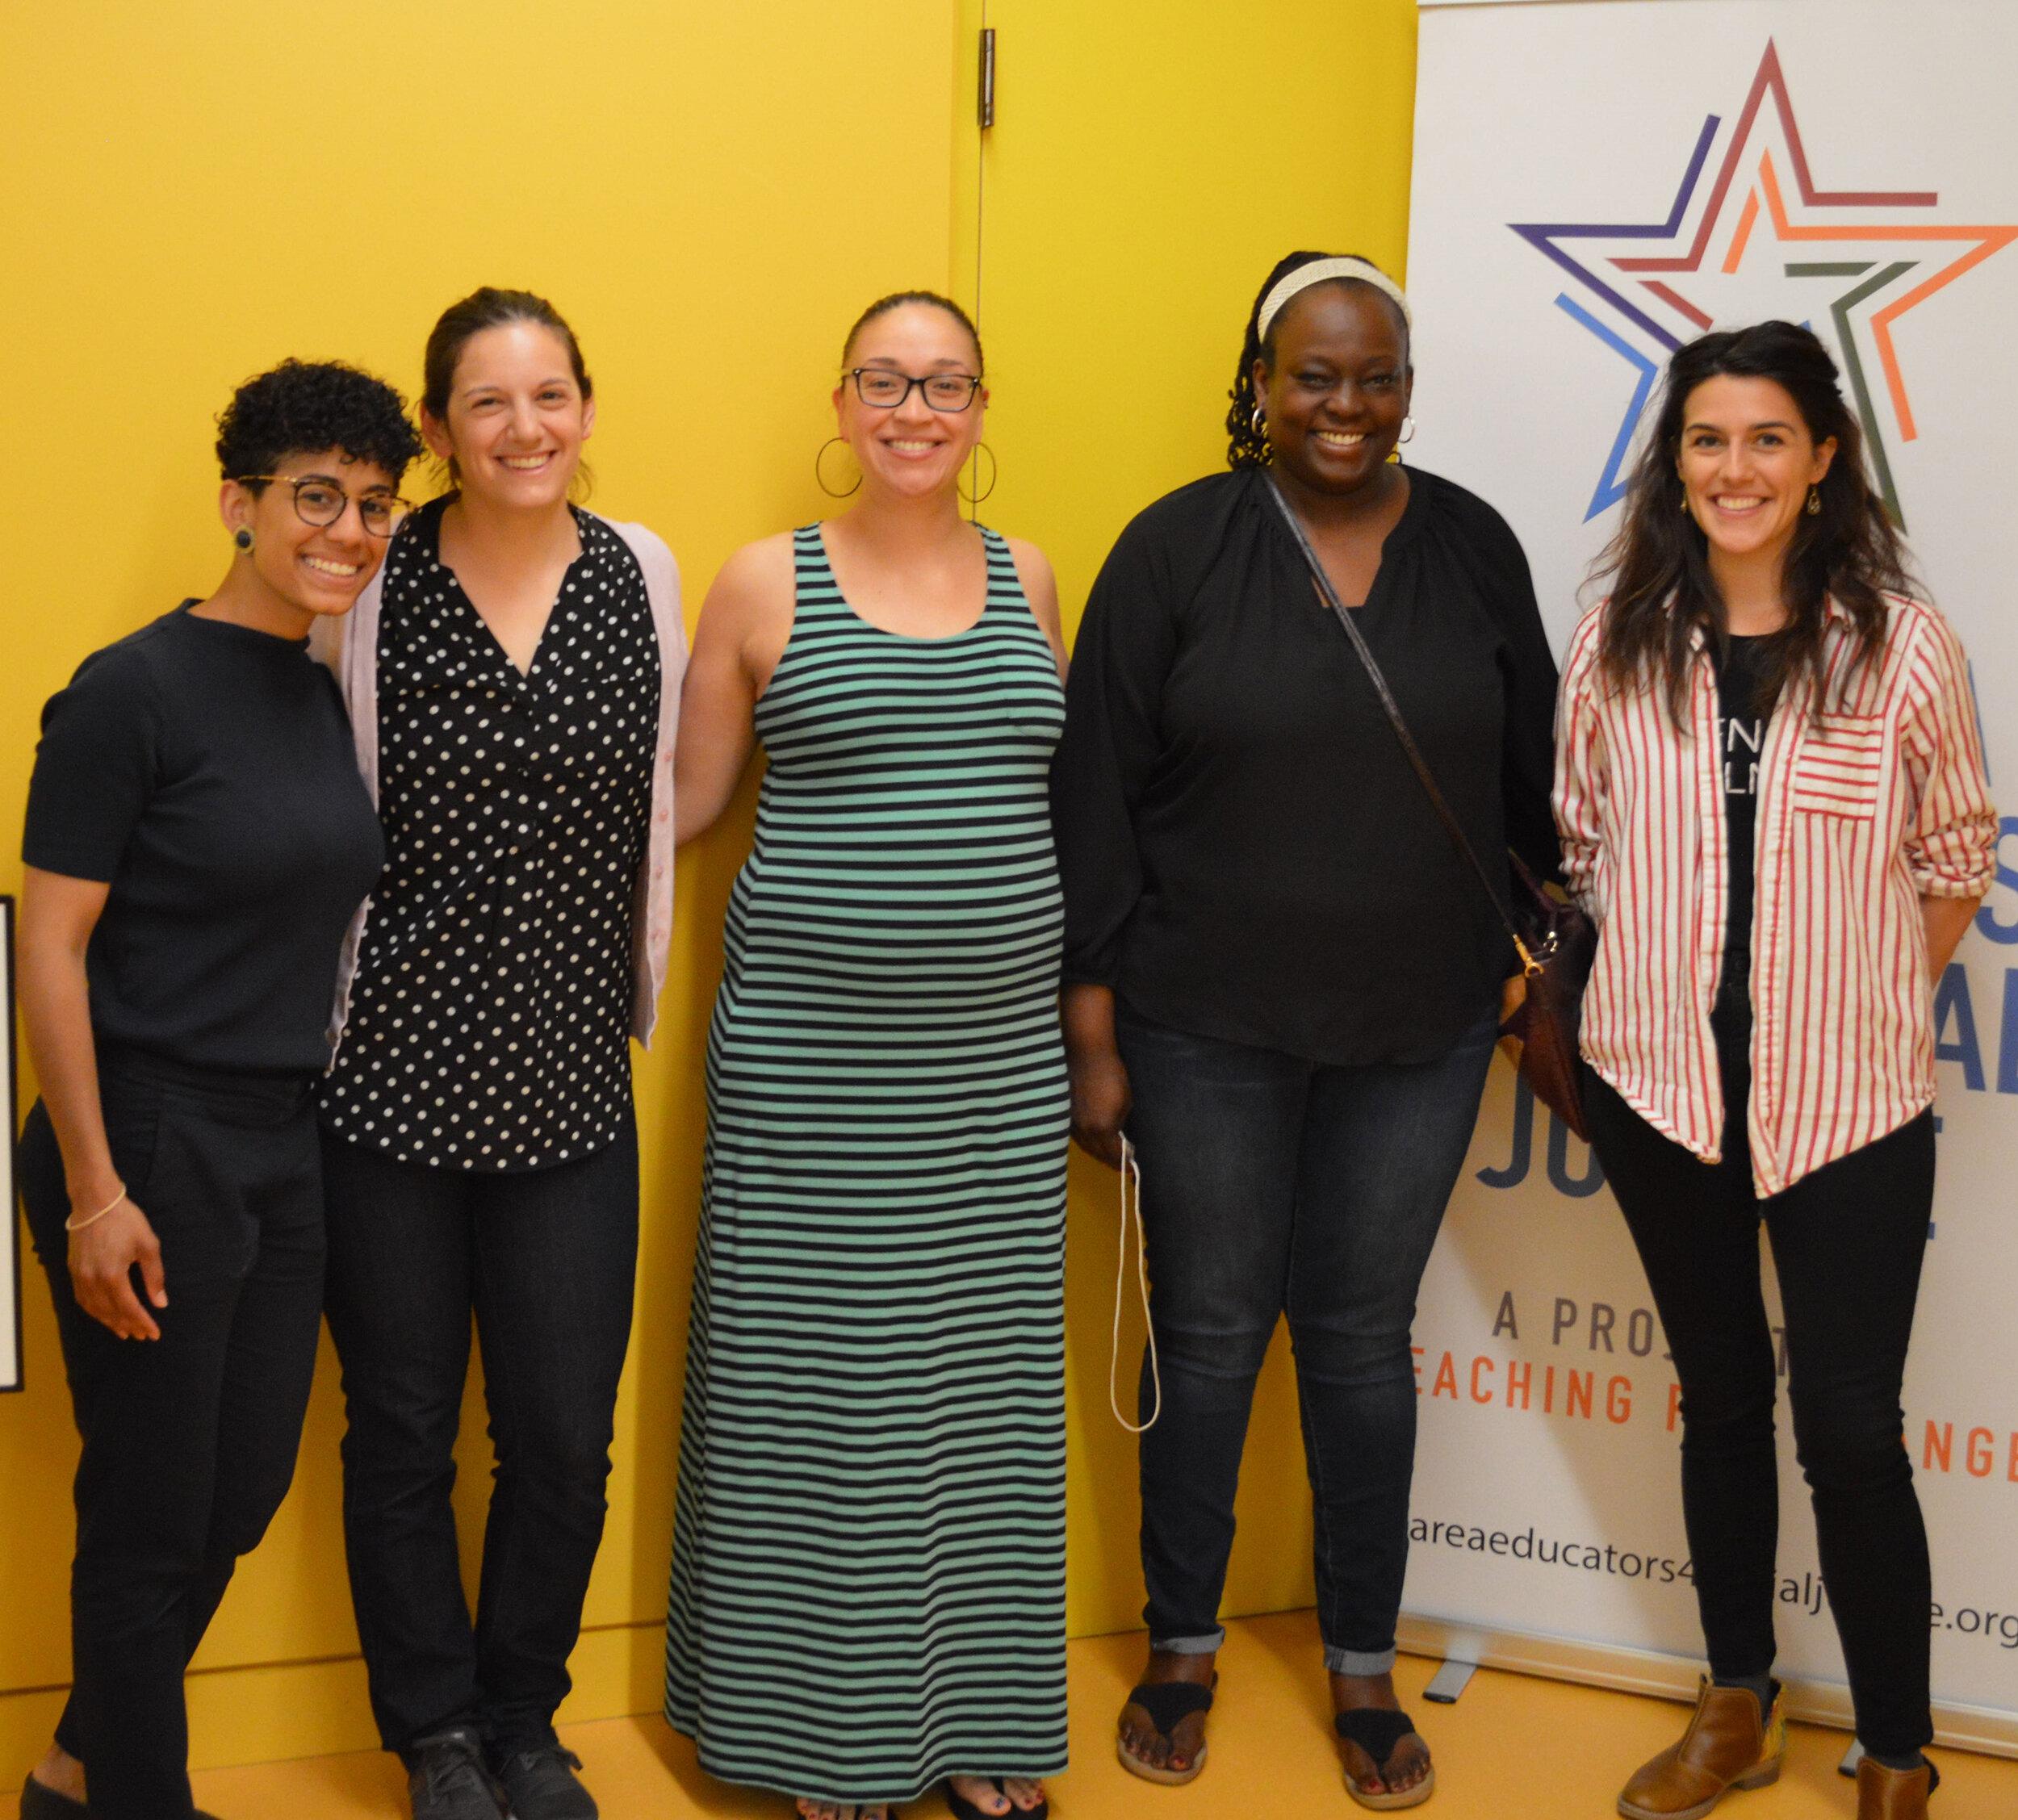 Anti-Bias Early Childhood Leadership Team Members  (from left to right), Rosalie Reyes, Shayna Tivona, Makai Kellogg, Denisha Jones, Marissa Howser (not captured: Carlos Duque, Nichelle Dowell)